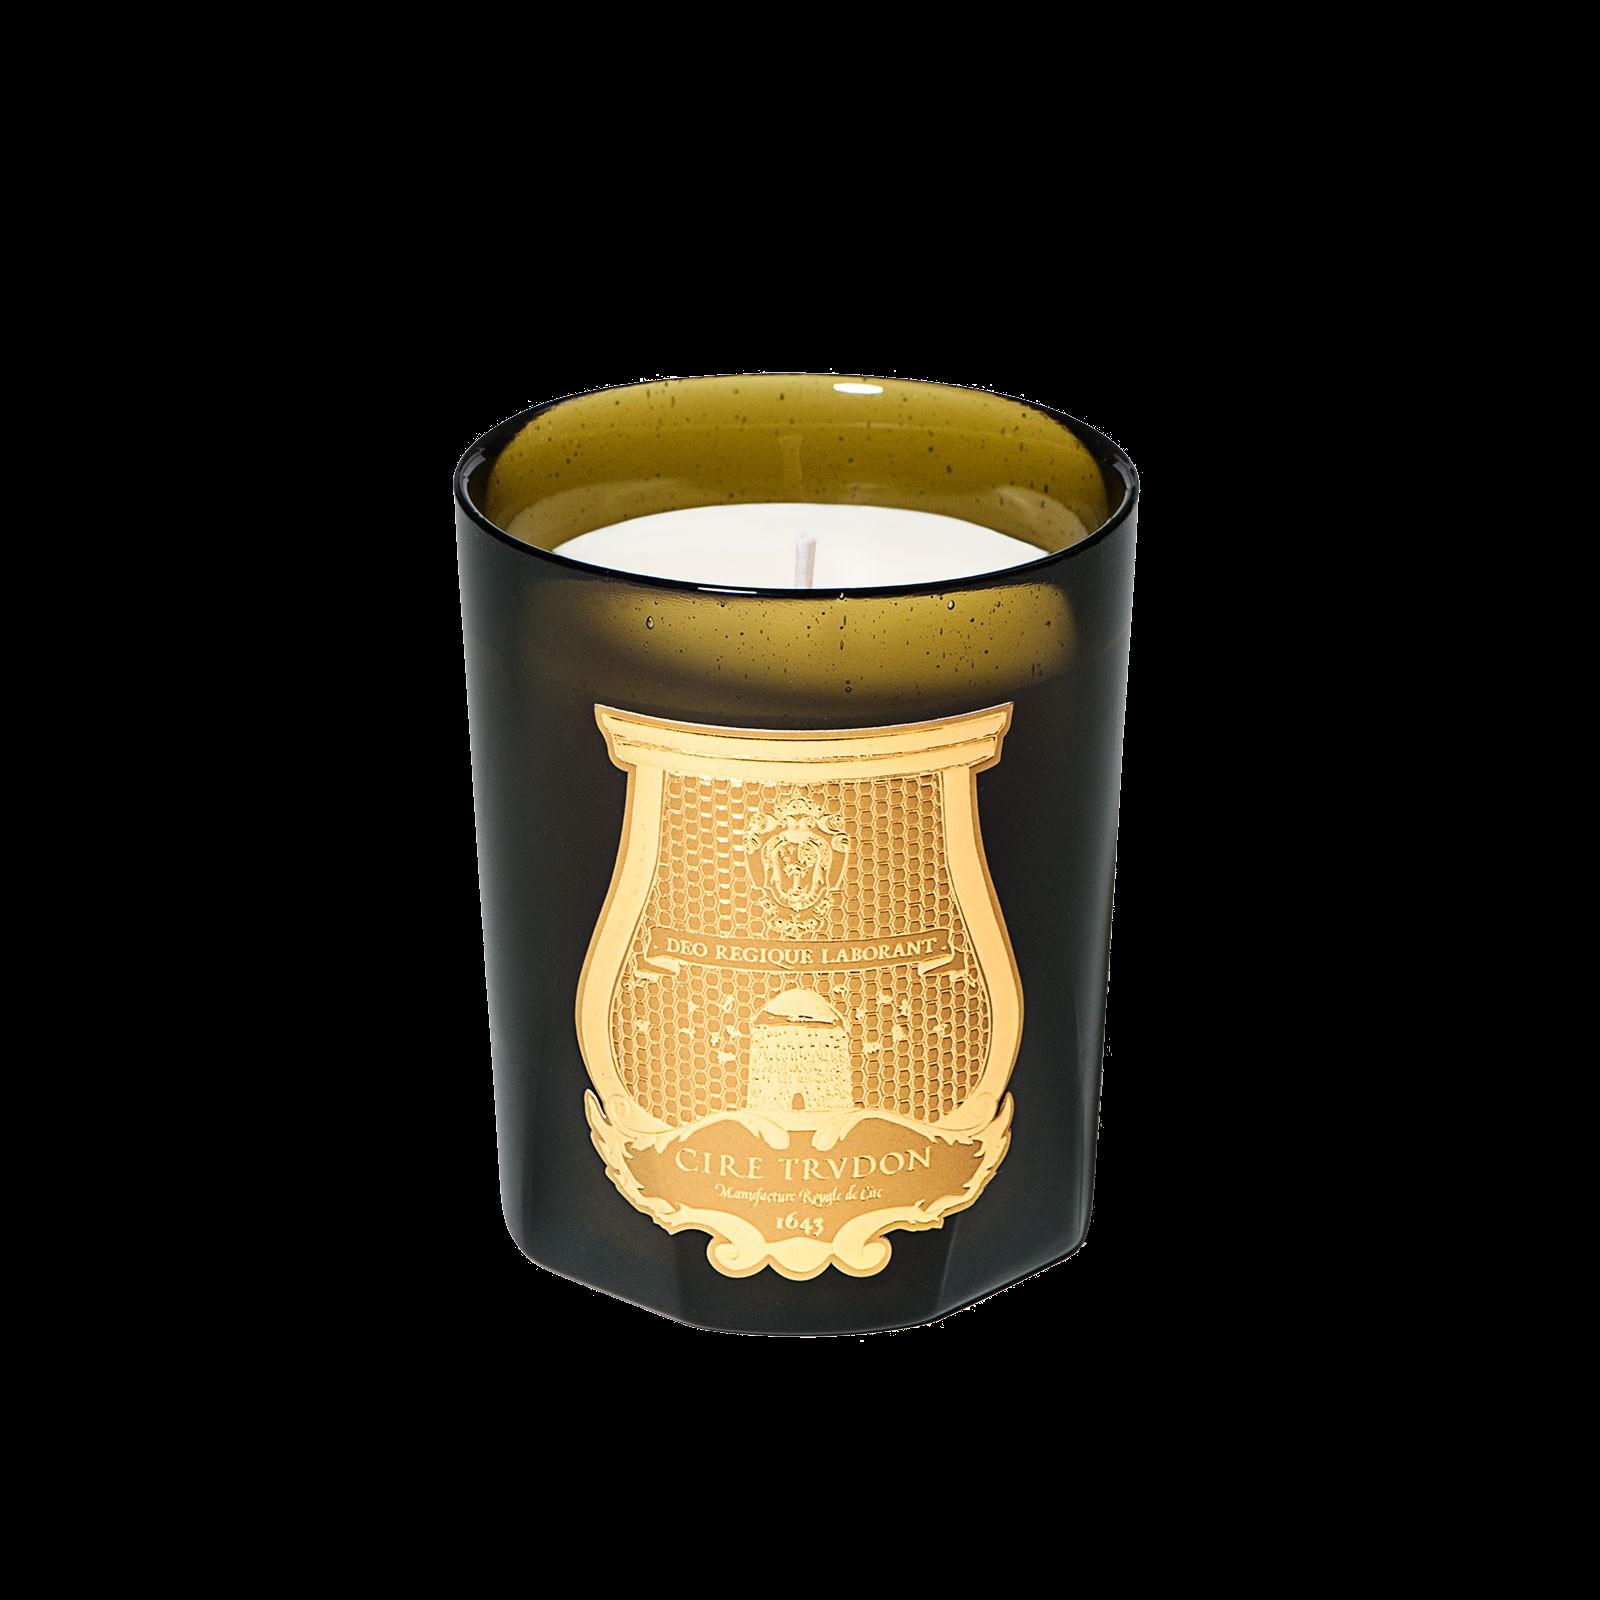 Care Trudon Spirit de Sancti Candle